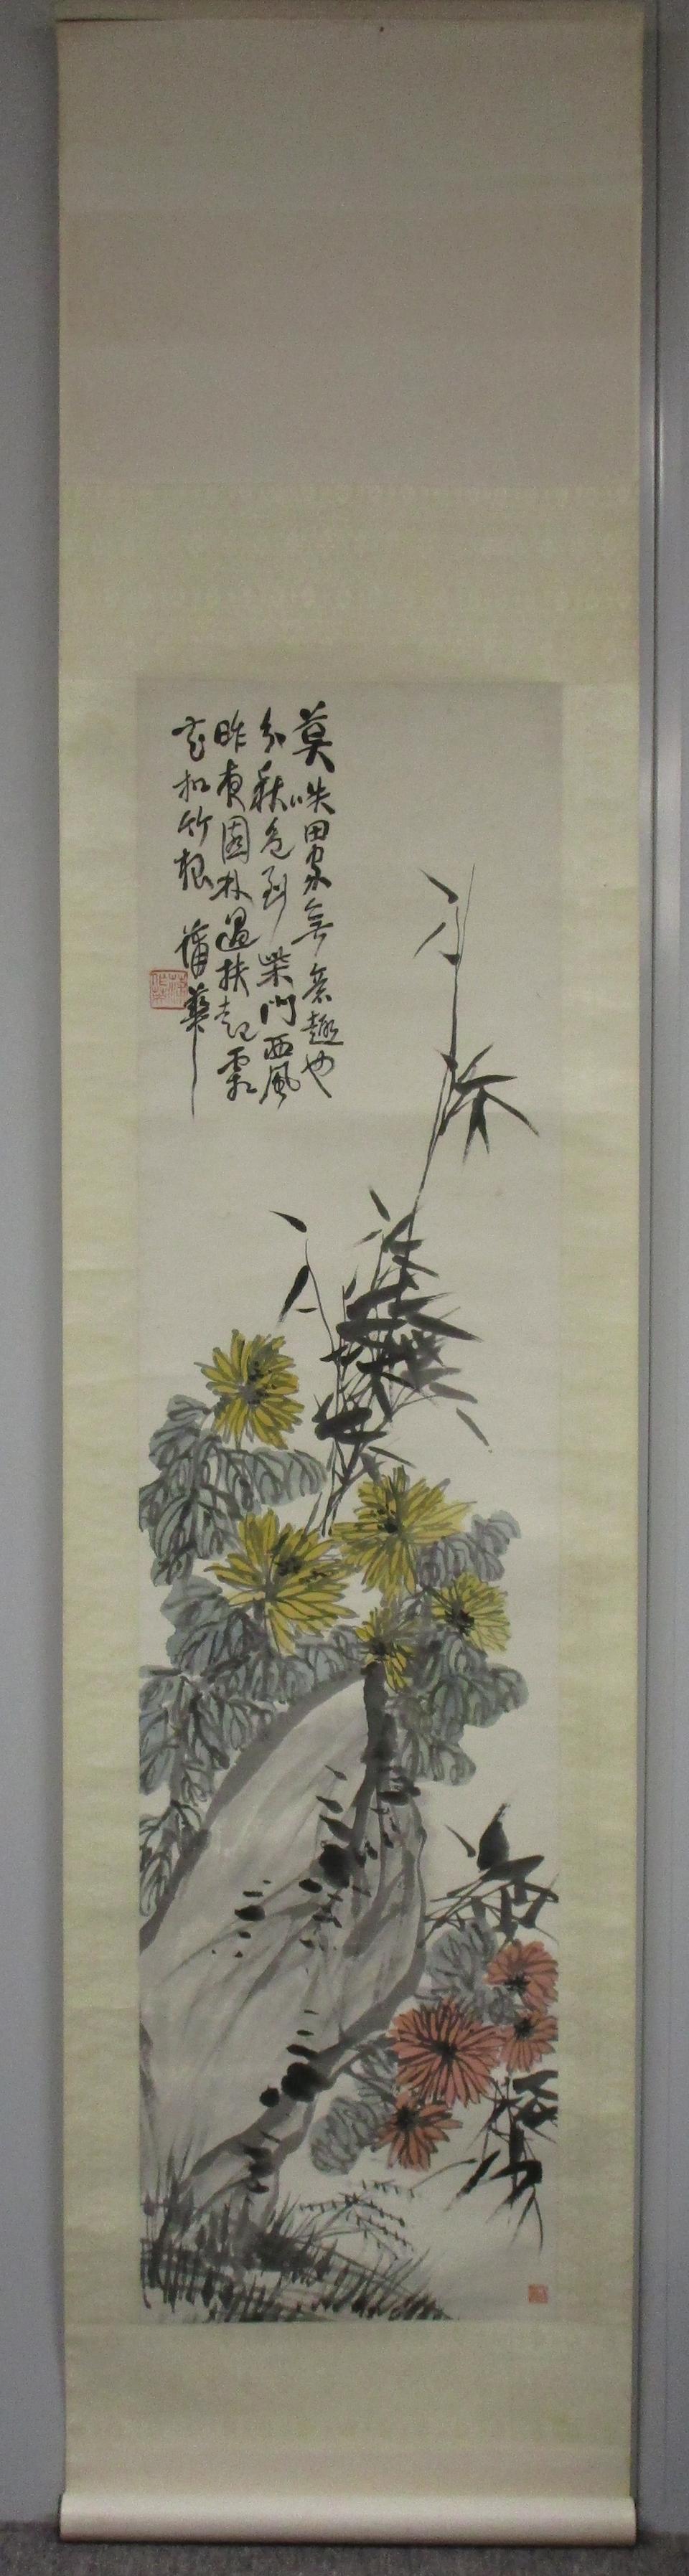 Pu Hua (1832-1911) Chrysanthemum, Bamboo and Rock